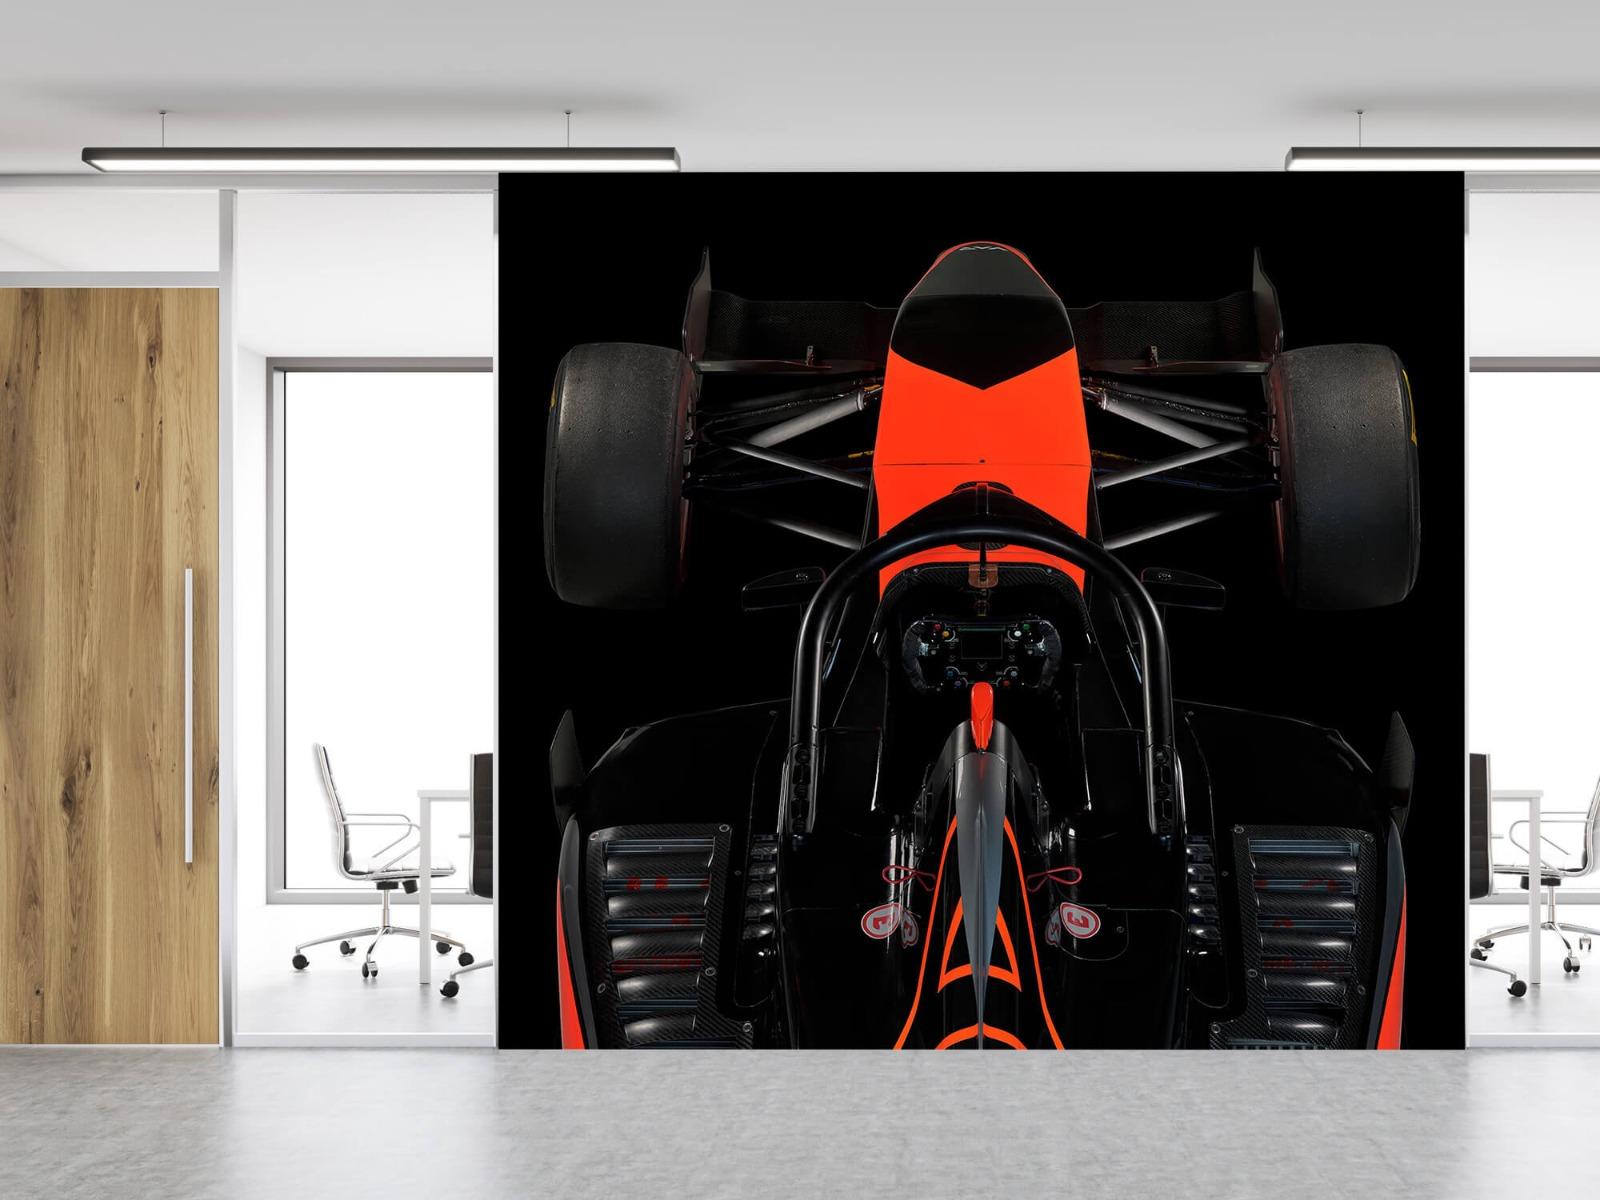 Sportauto's - Formule 3 - Cockpit view - dark - Tienerkamer 11